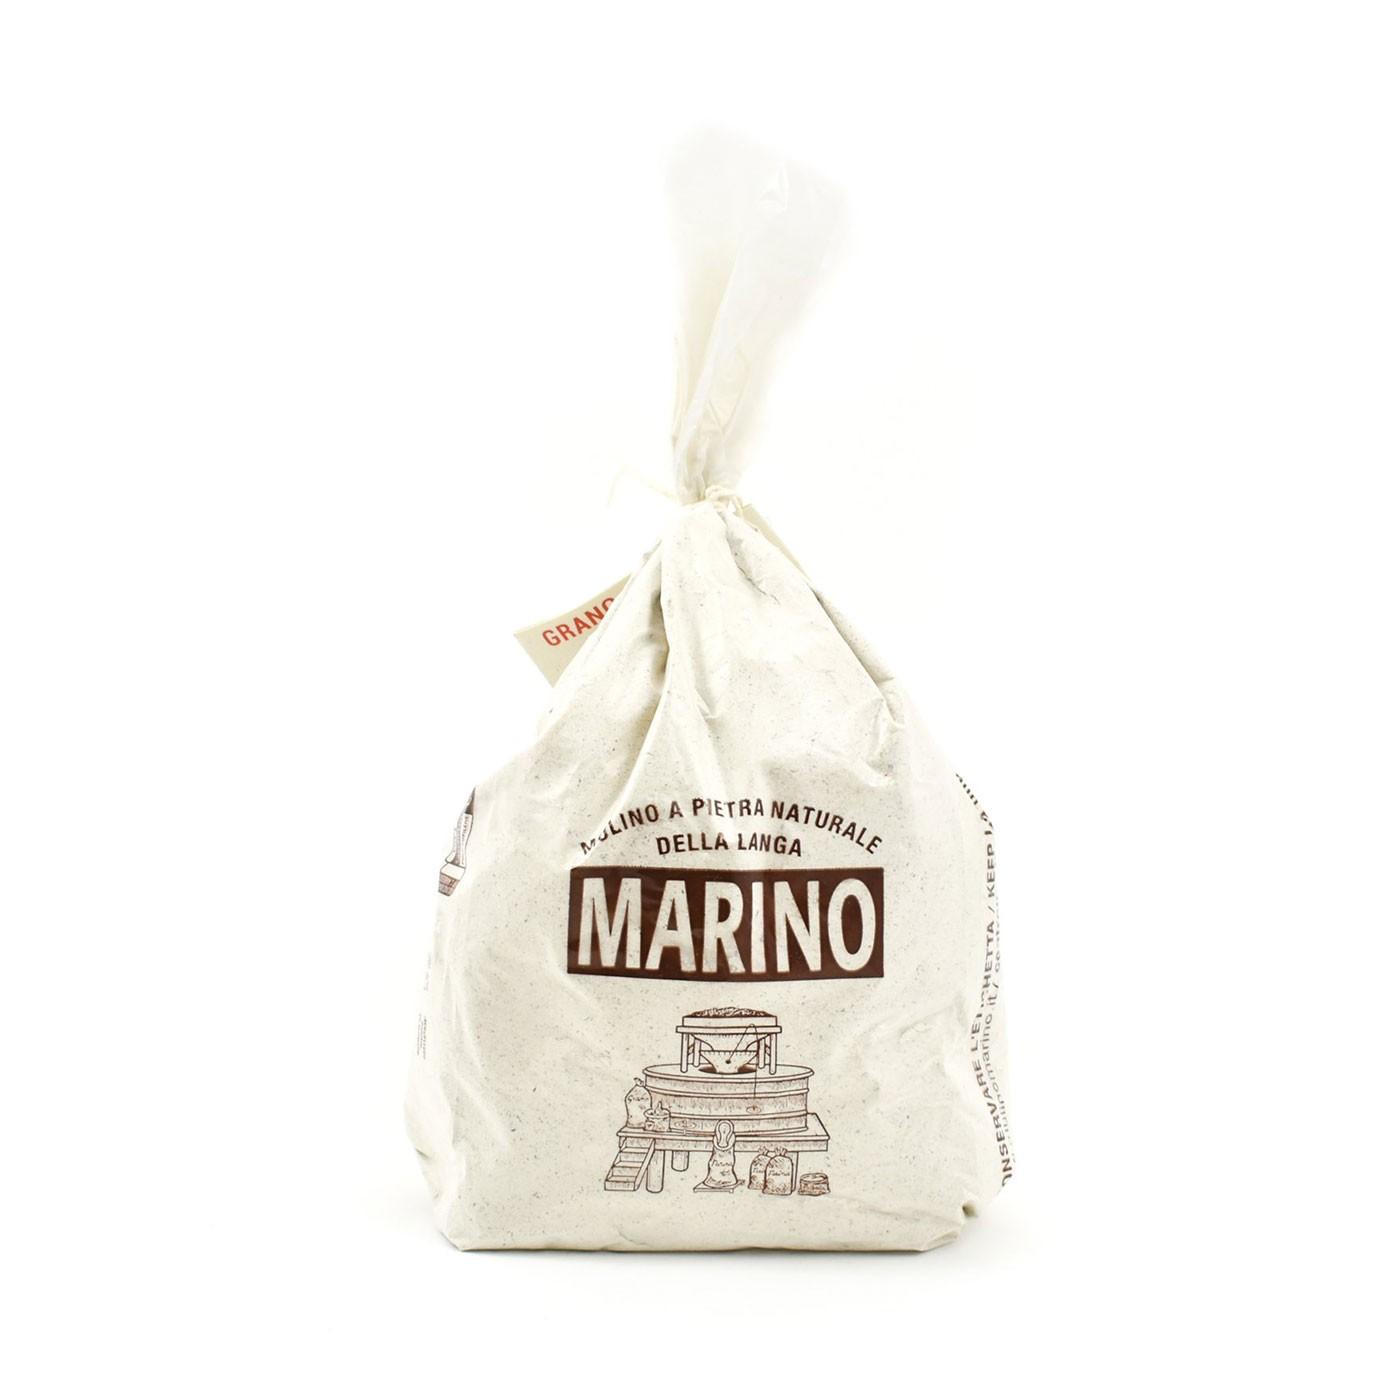 Organic Semolina Durum Wheat Flour 35.3 oz